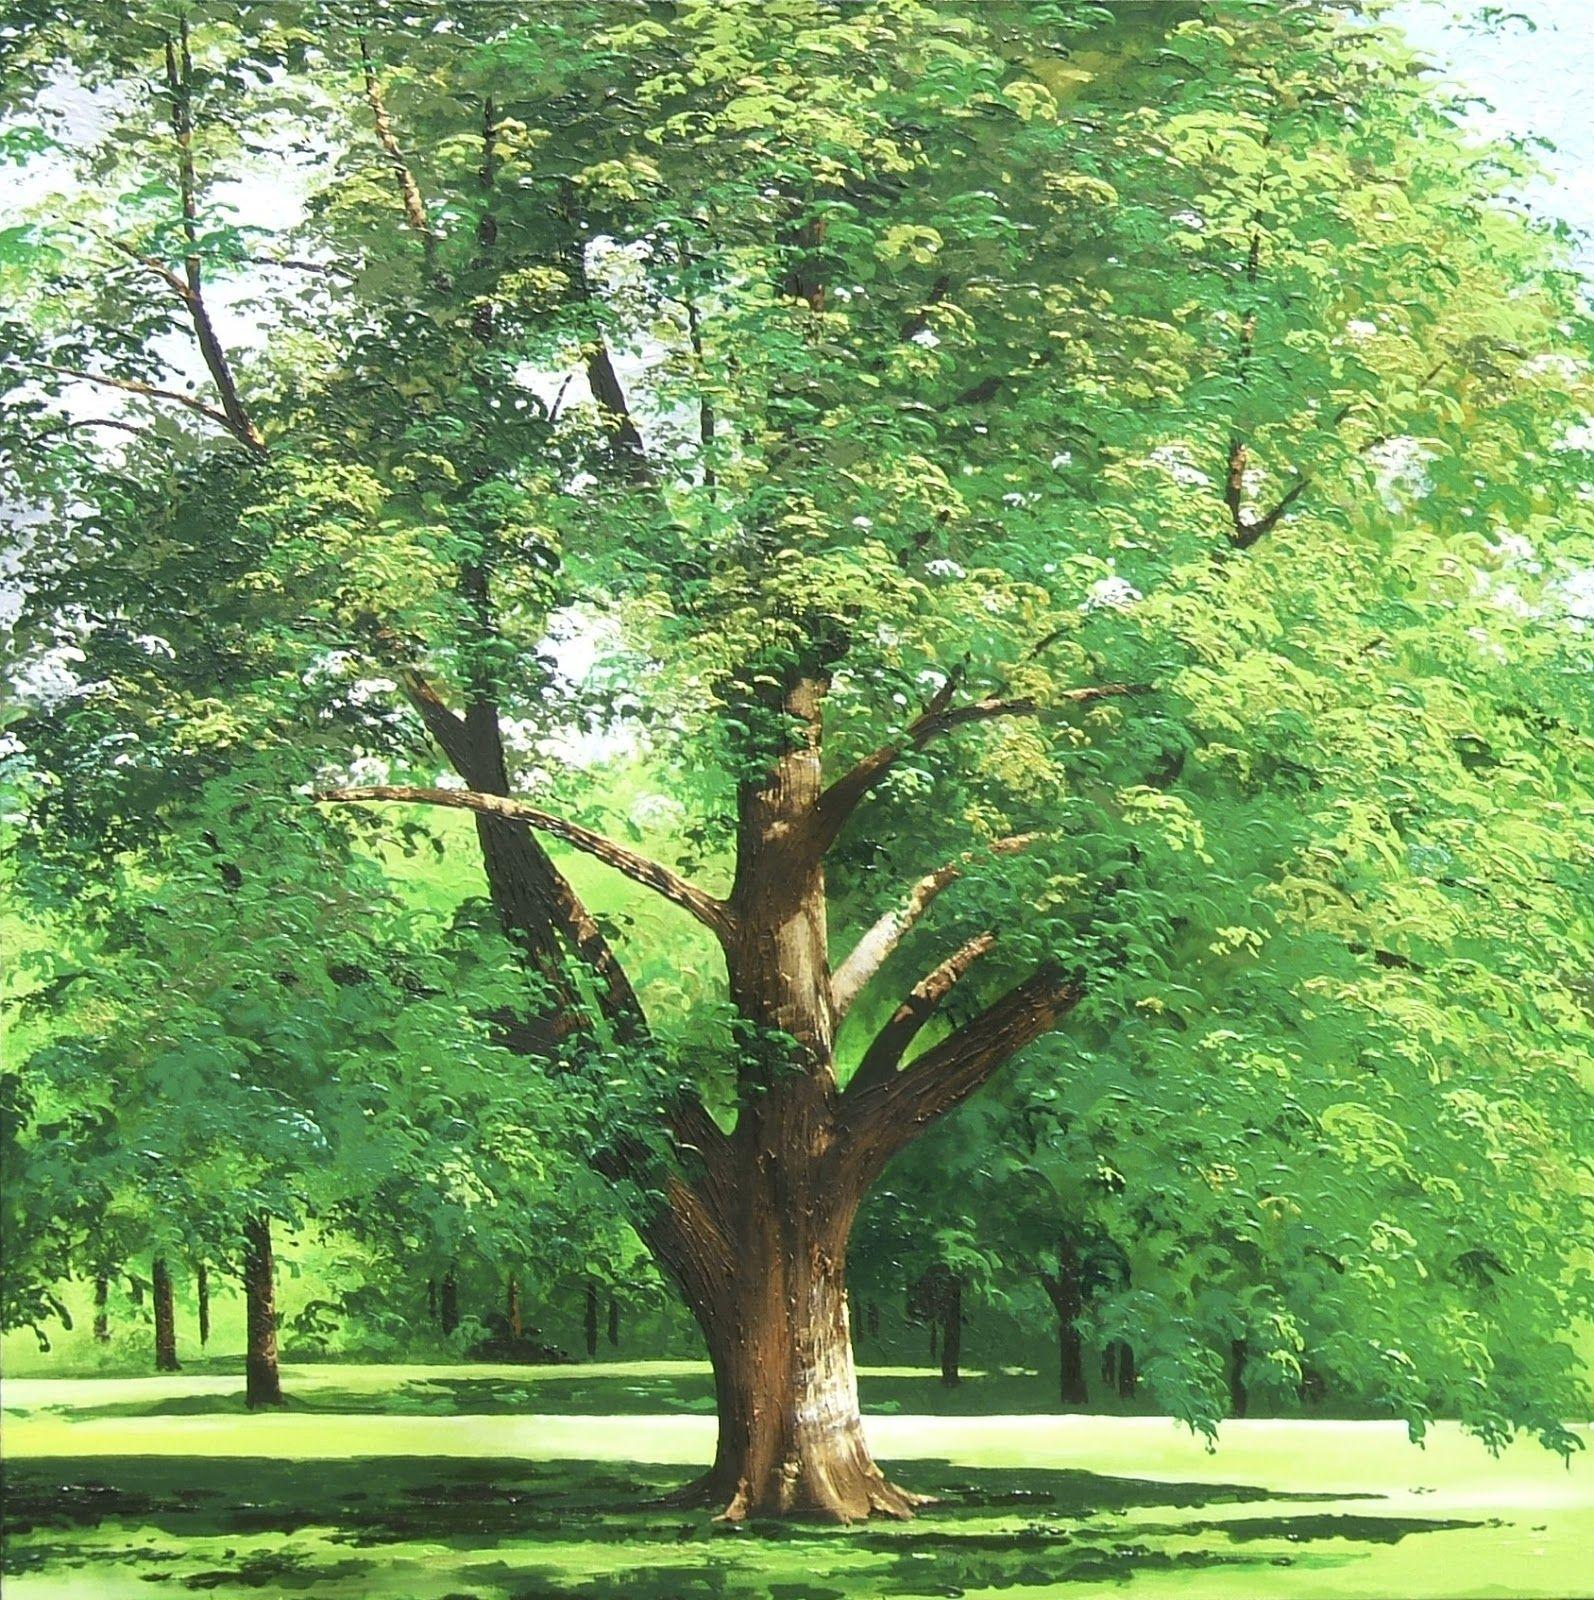 1.bp.blogspot.com -HMbiZnhqCq0 USFAHy-dWjI AAAAAAAAANA v0lhwFgtmfg s1600 L'arbre+est+dans+ses+feuilles.jpg